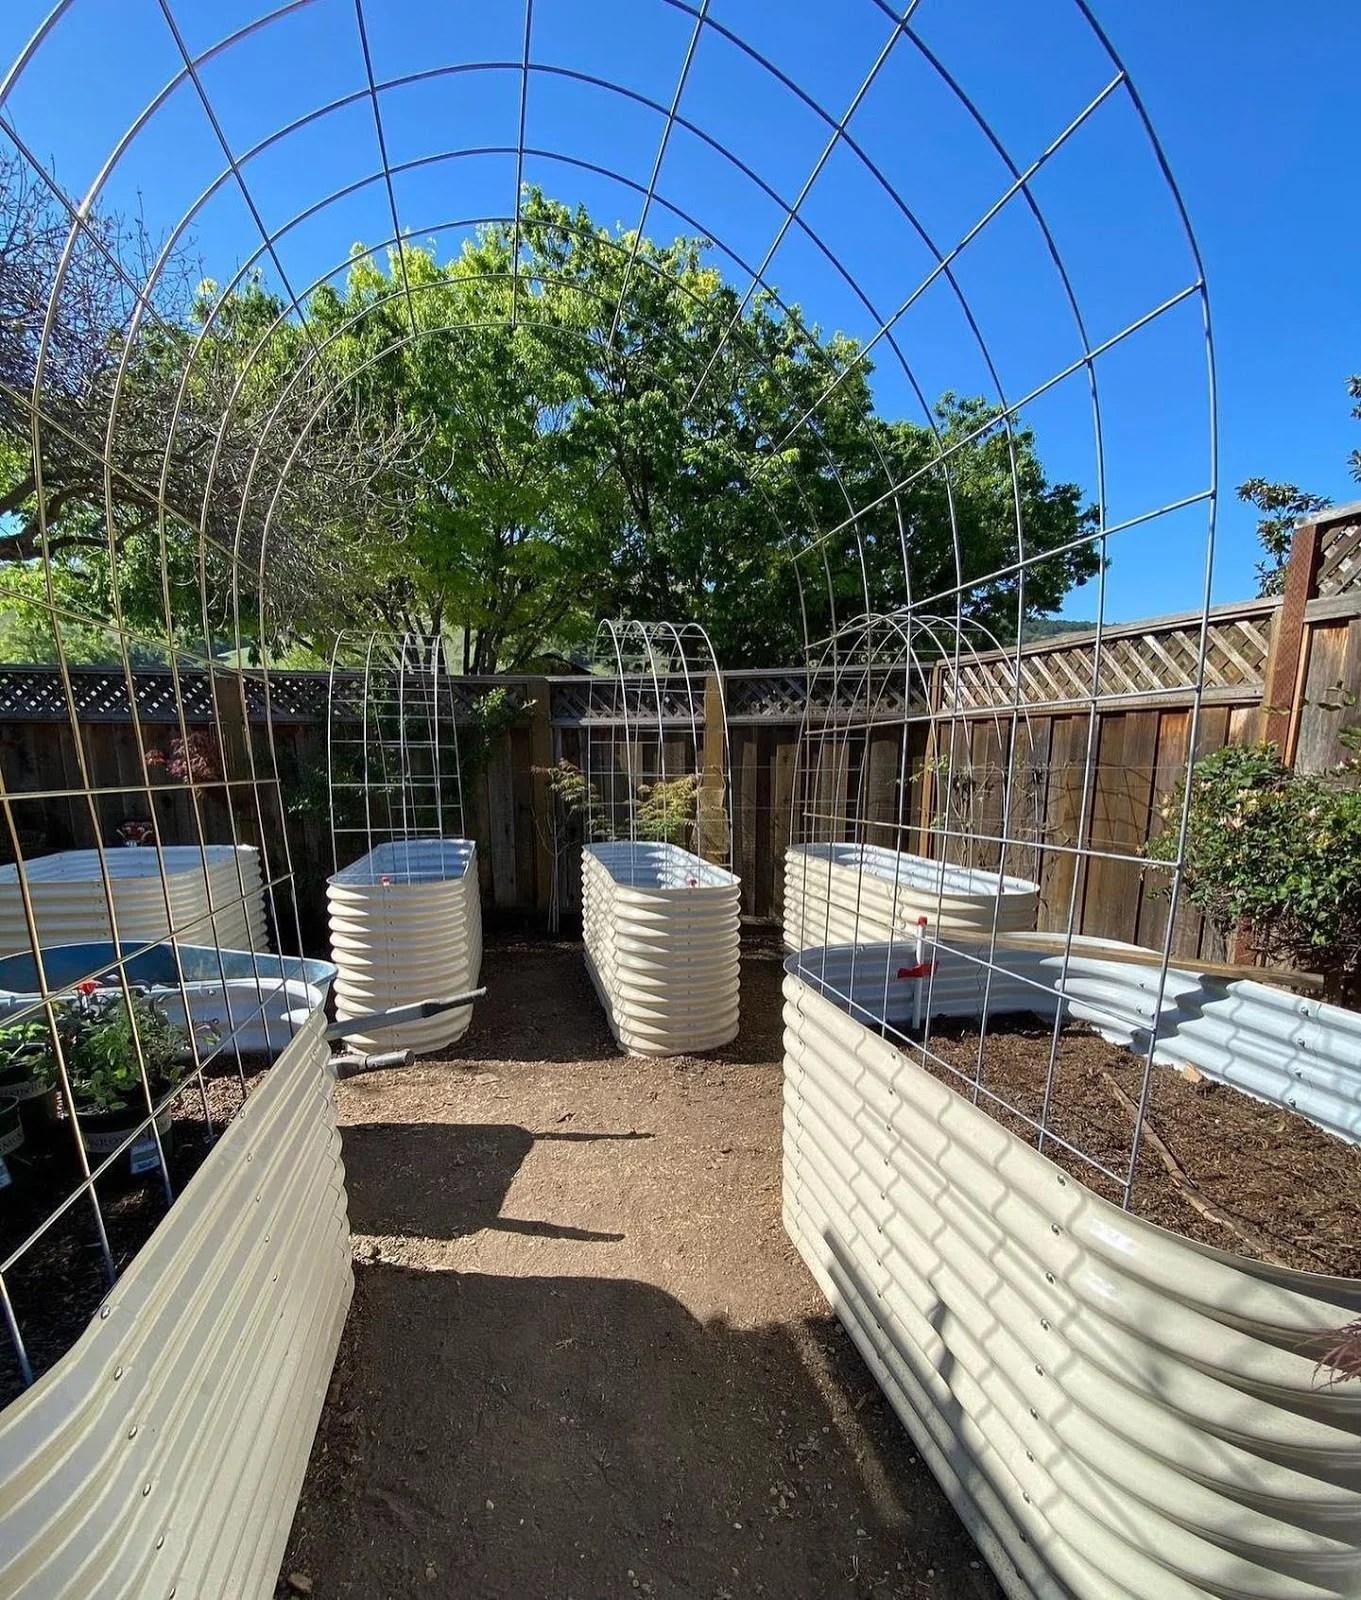 Metal Raised Garden Beds: Benefits and Installment Tips 2021